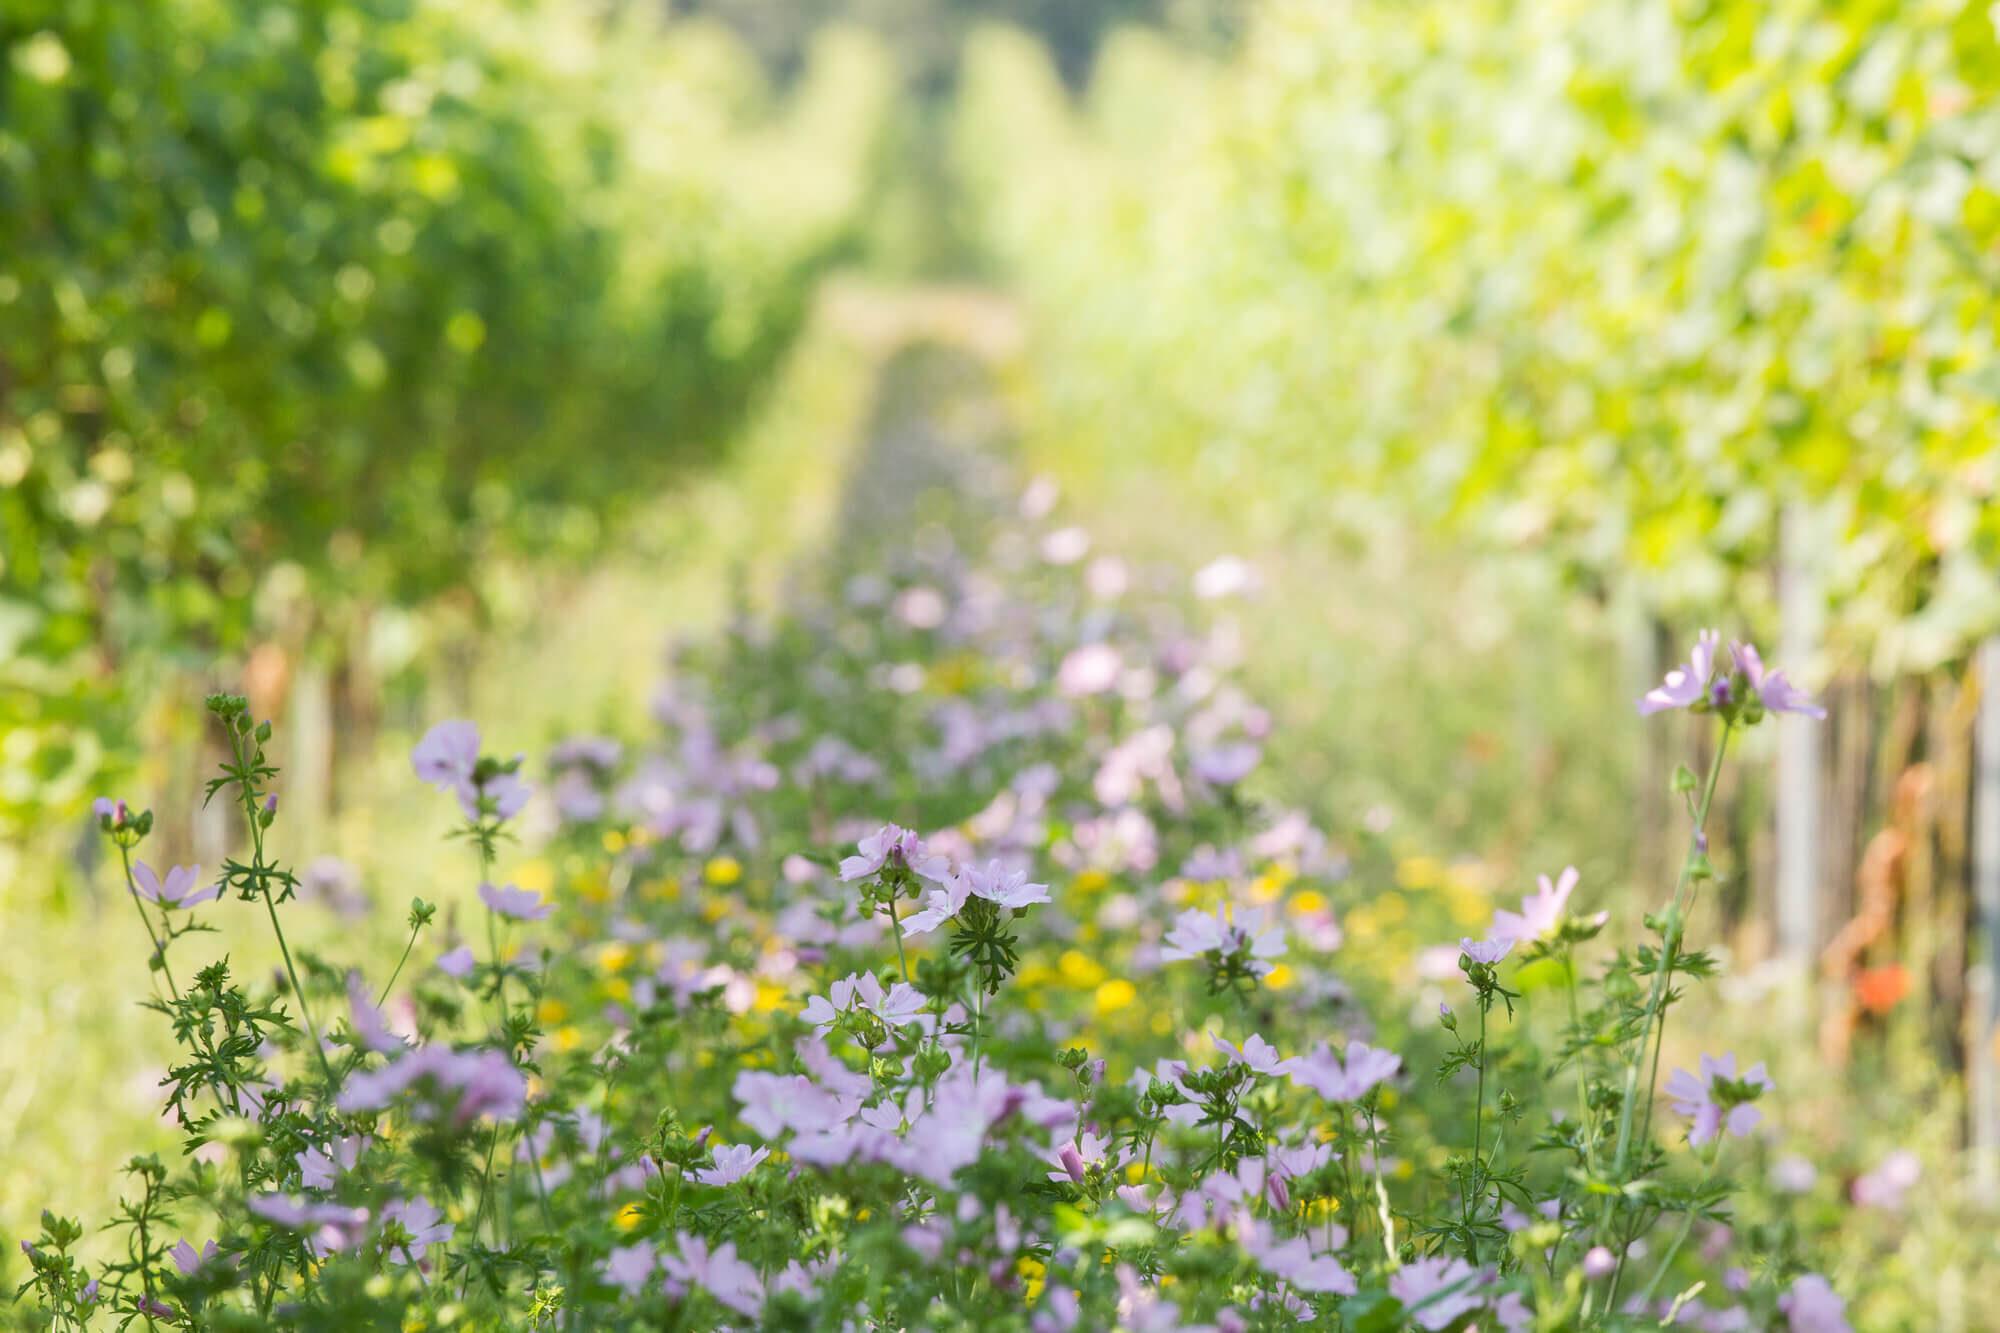 Inter-row flowers